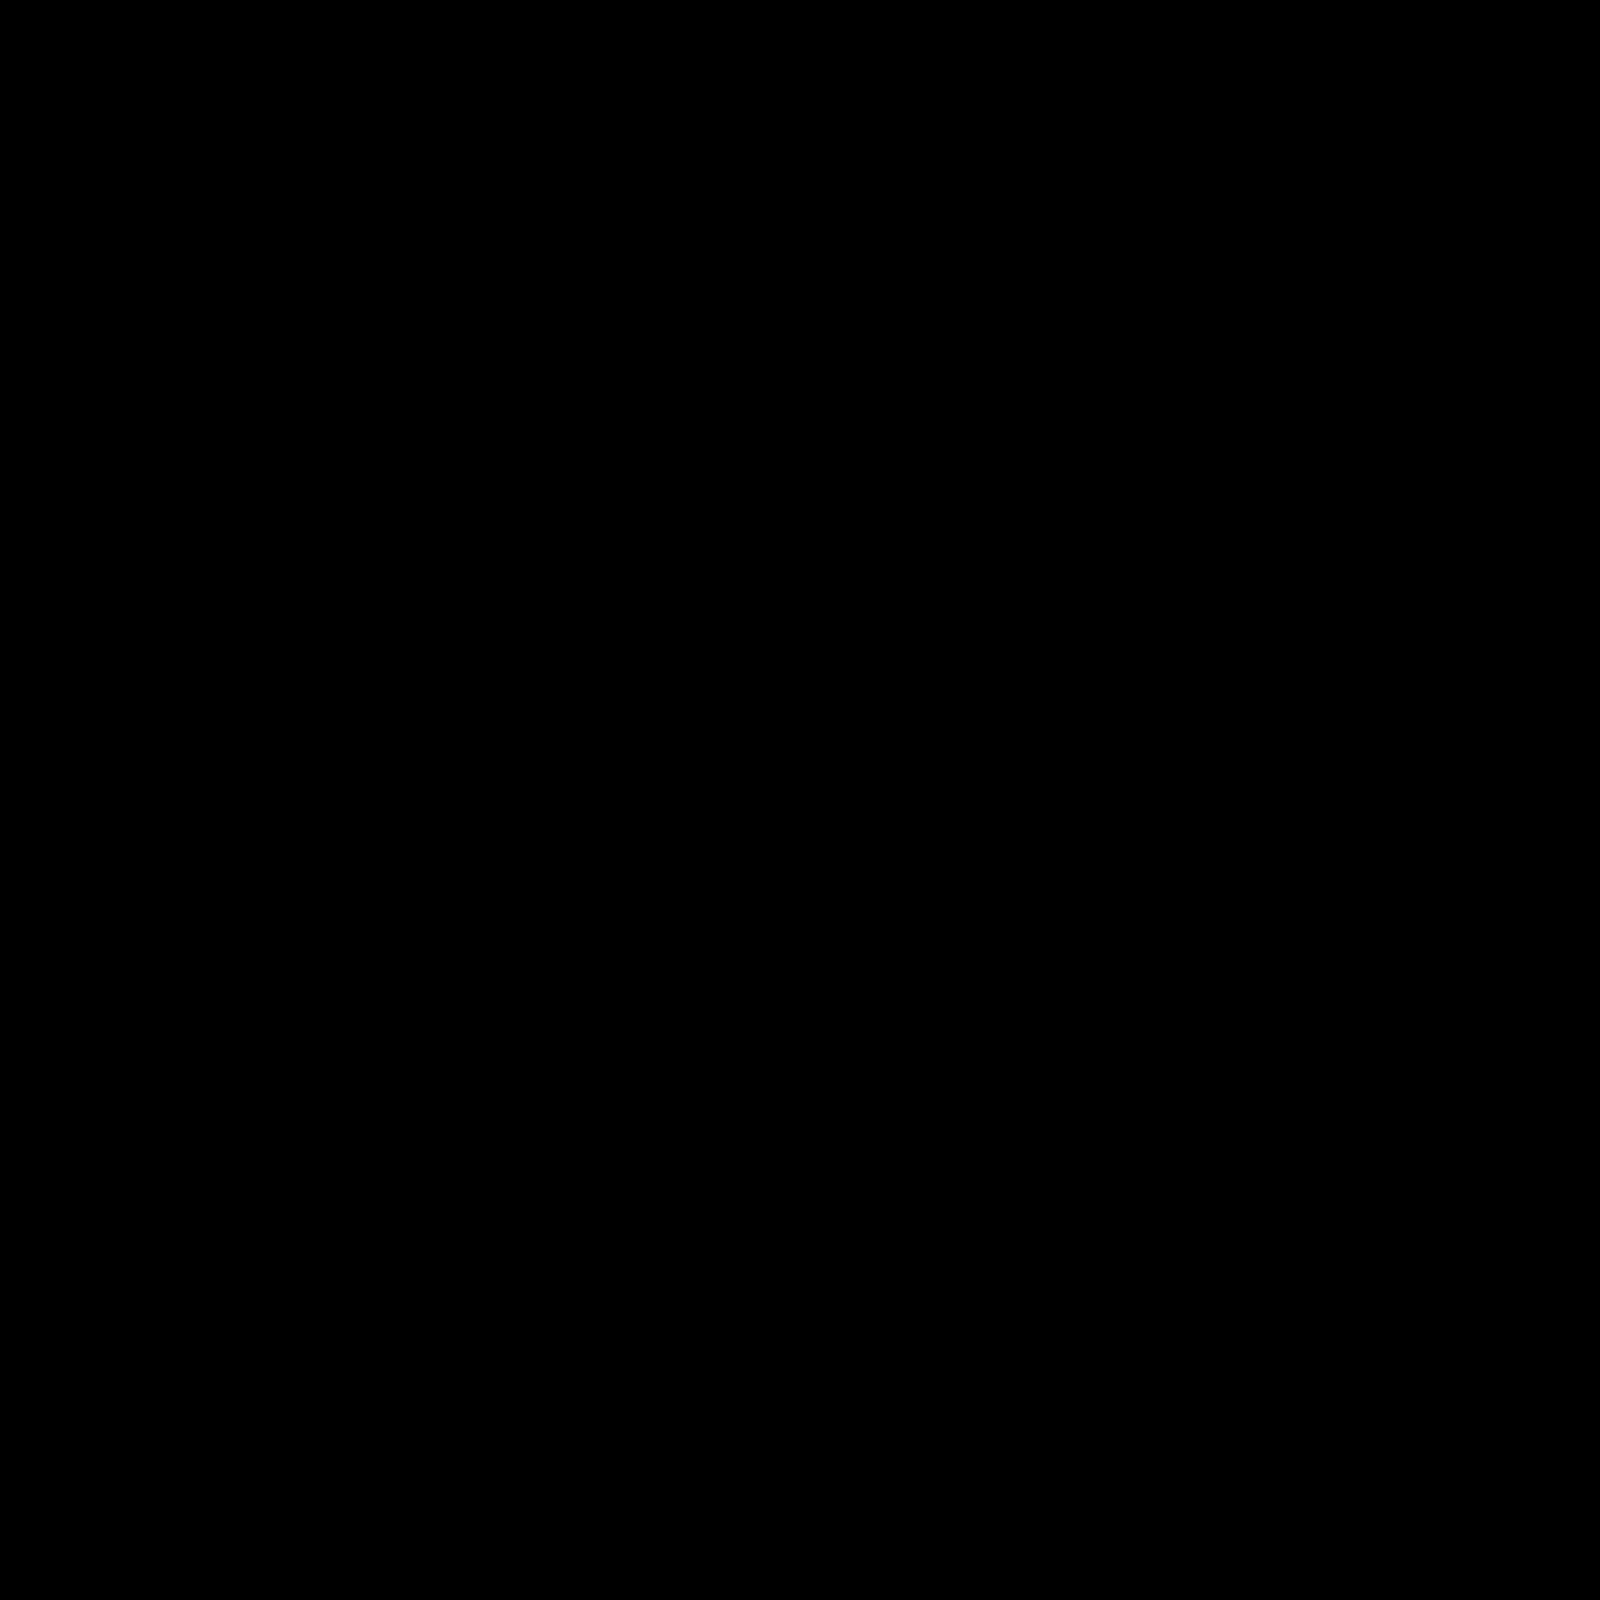 Torre de Pisa icon